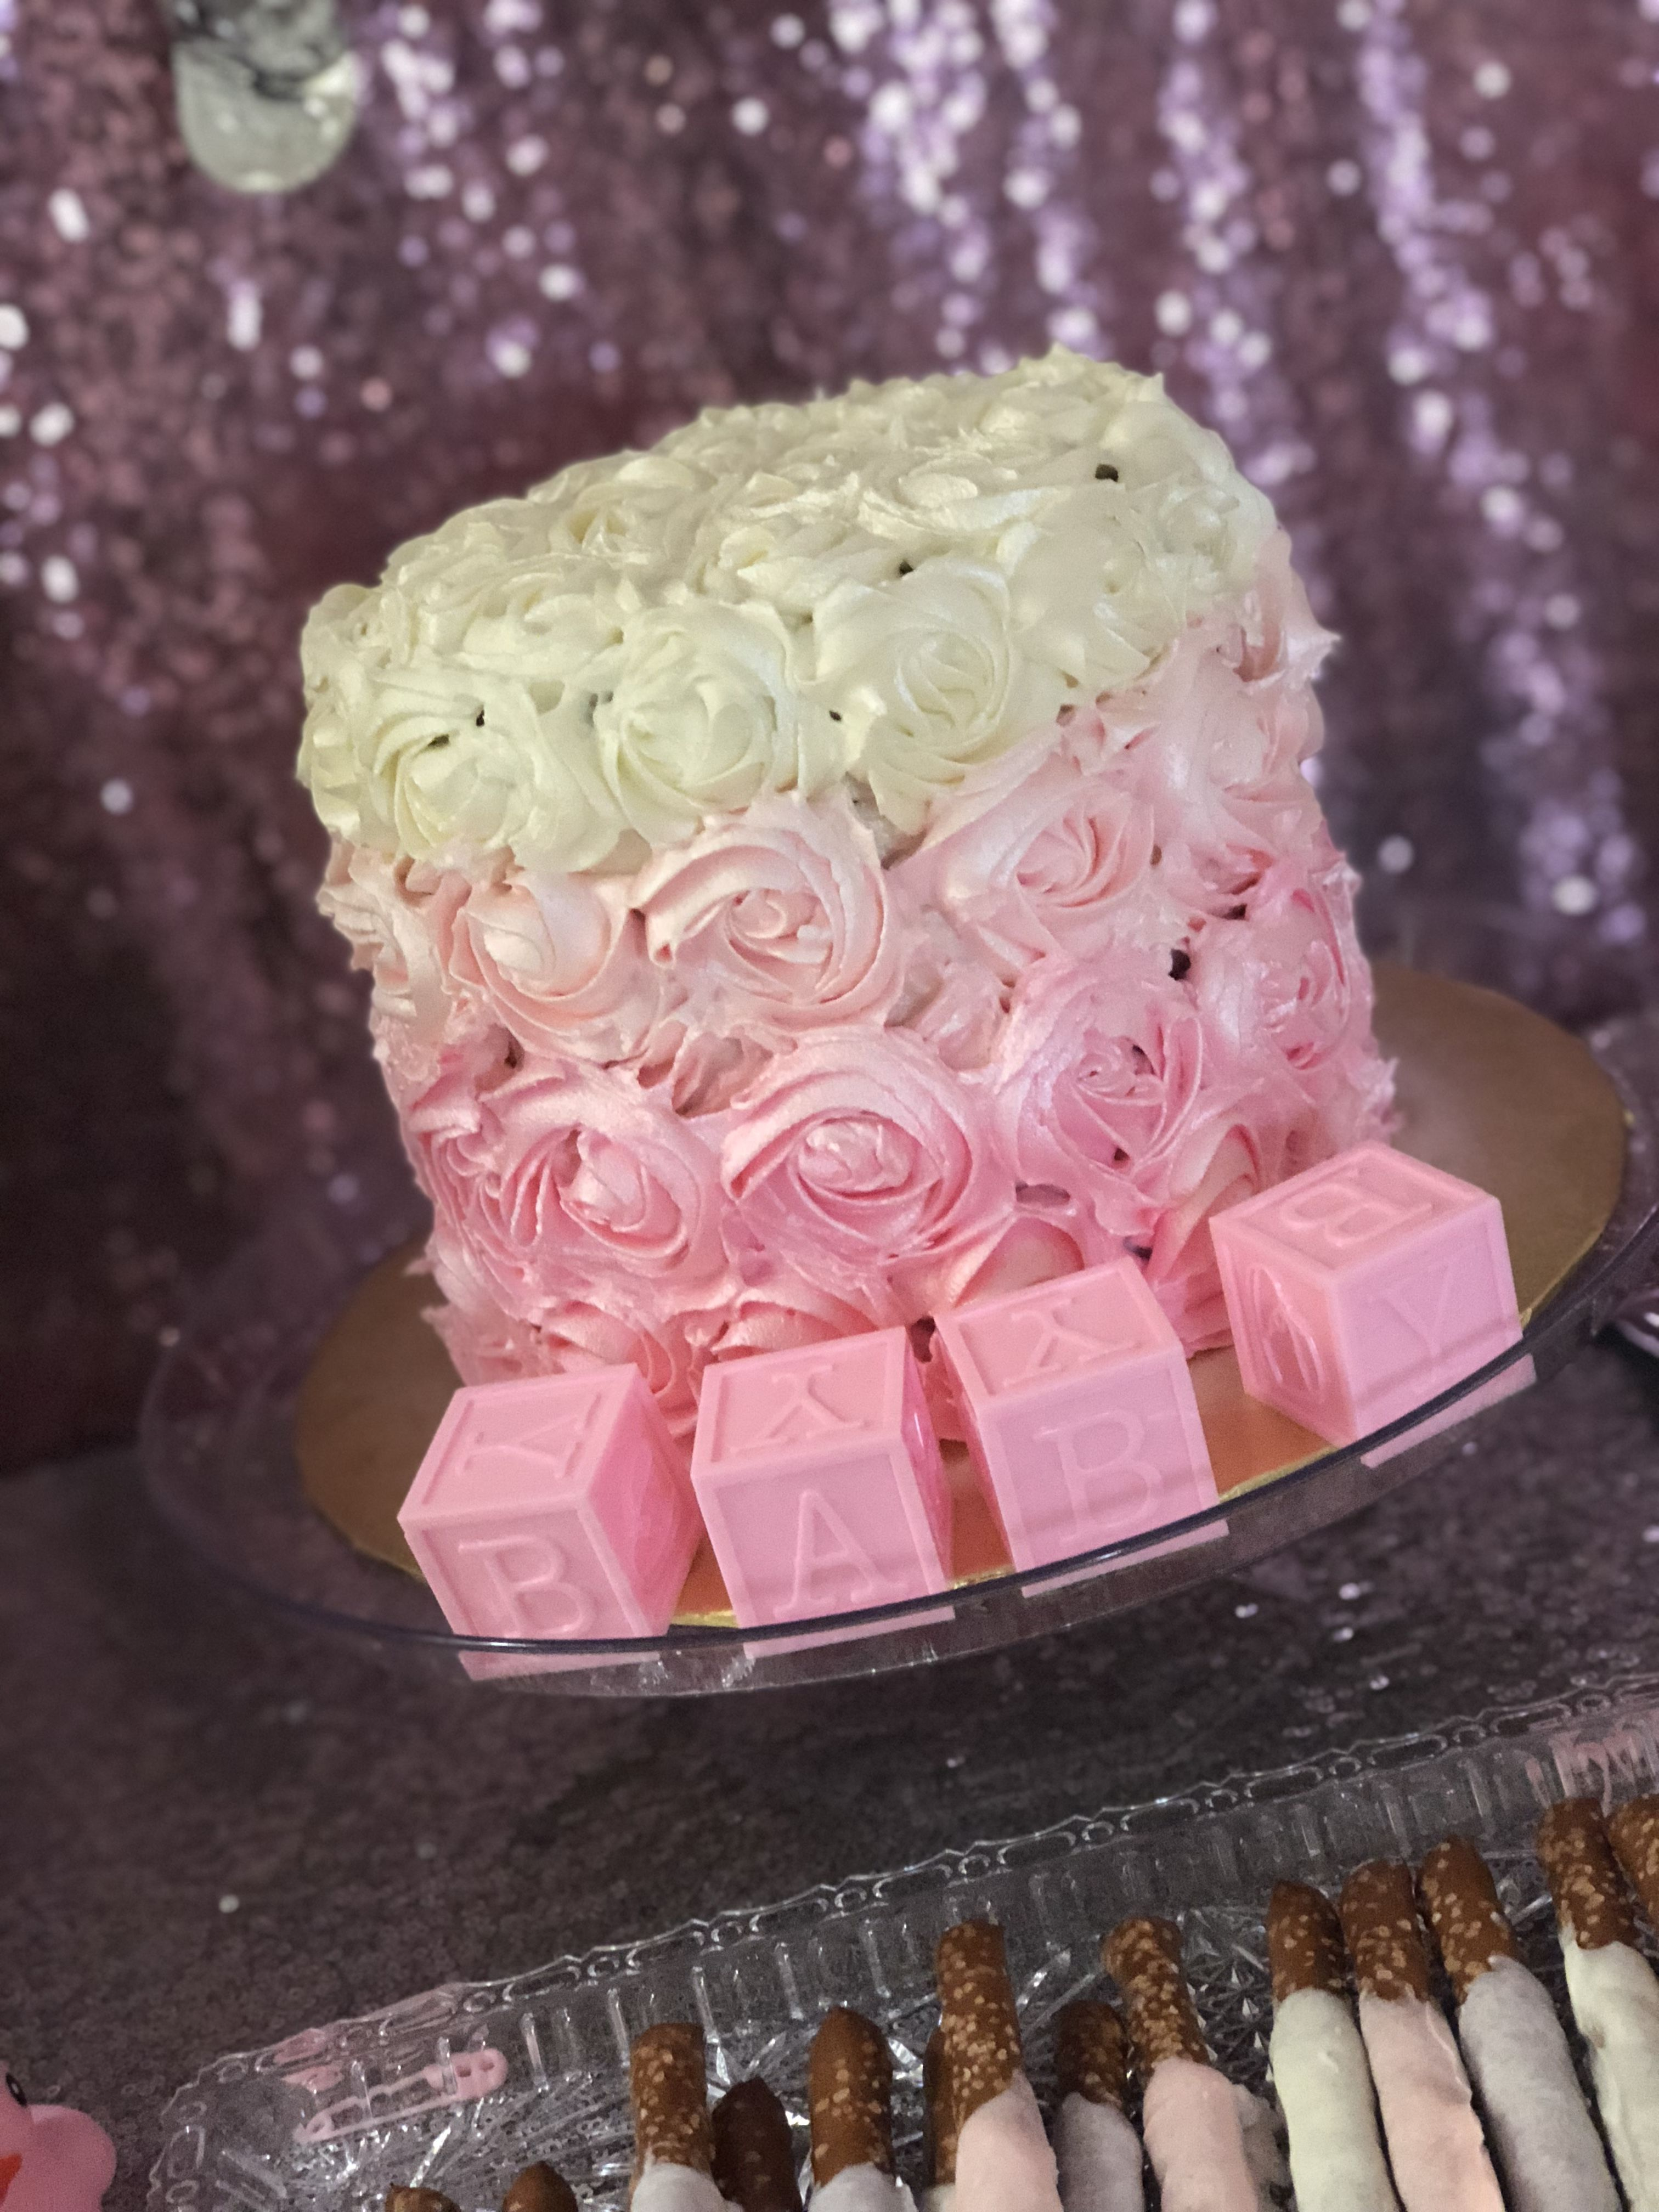 macaron drip cake baby shower gender reveal nj | Blue